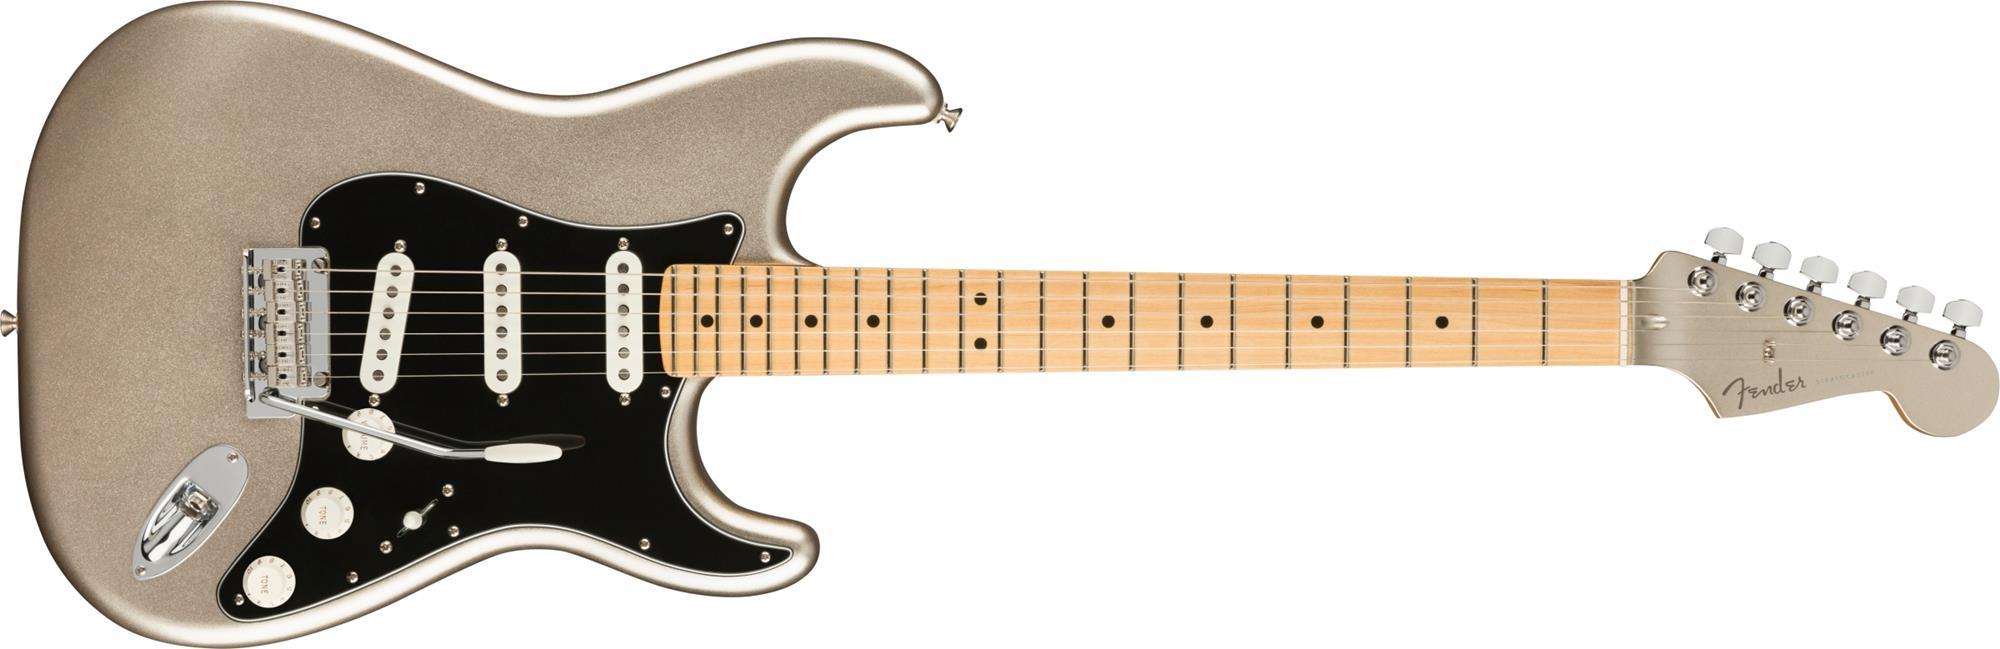 FENDER-75th-Anniversary-Stratocaster-MN-Diamond-Anniversary-0147512360-sku-24551